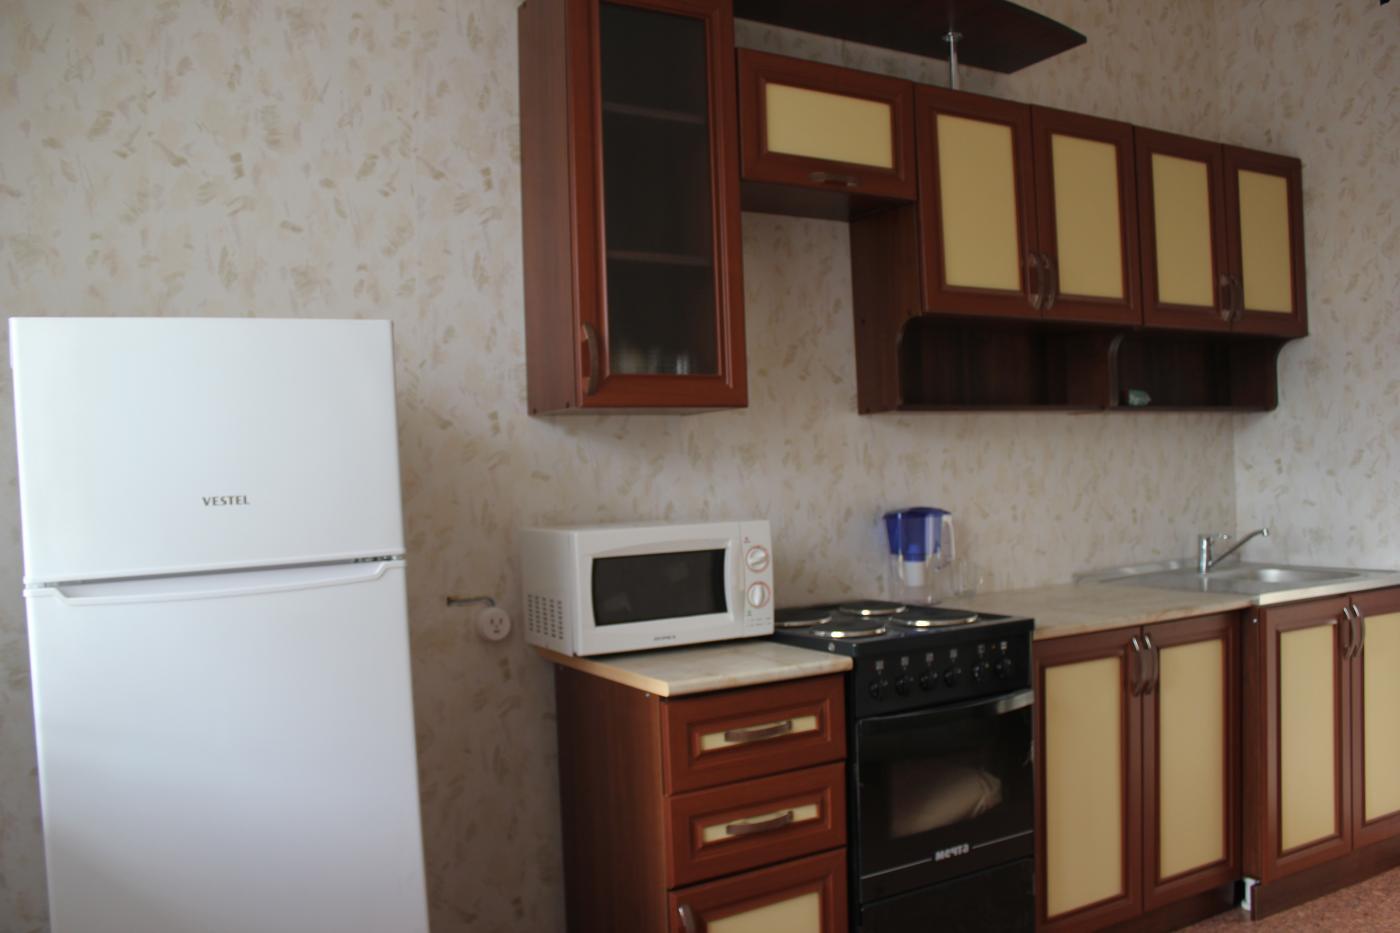 1-комнатная квартира посуточно (вариант № 4353), ул. Хользунова улица, фото № 3